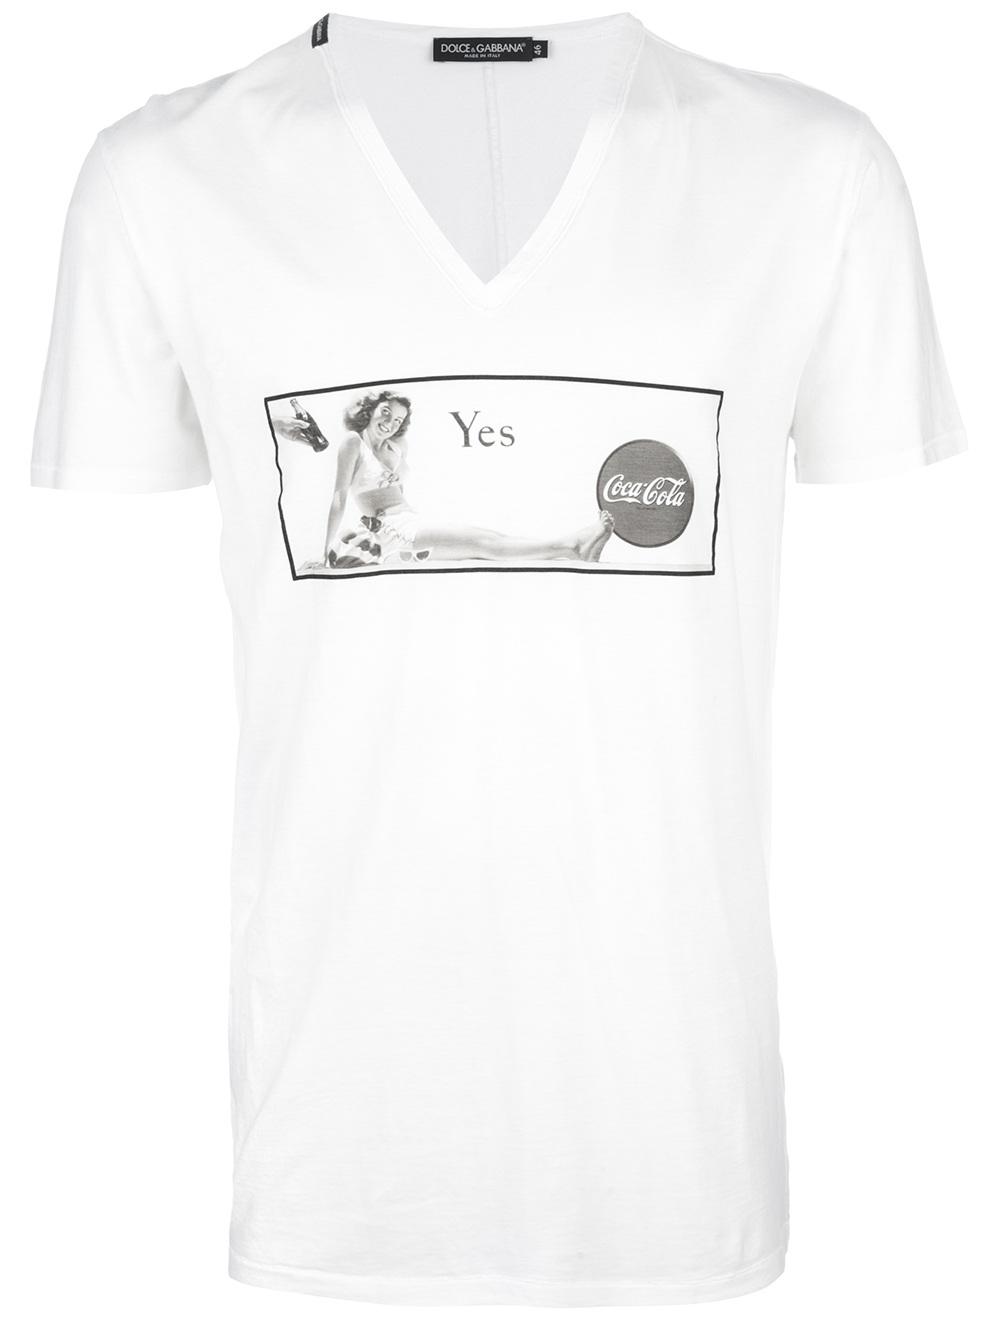 Dolce gabbana coca cola printed t shirt in white for men for Dolce and gabbana printed t shirts